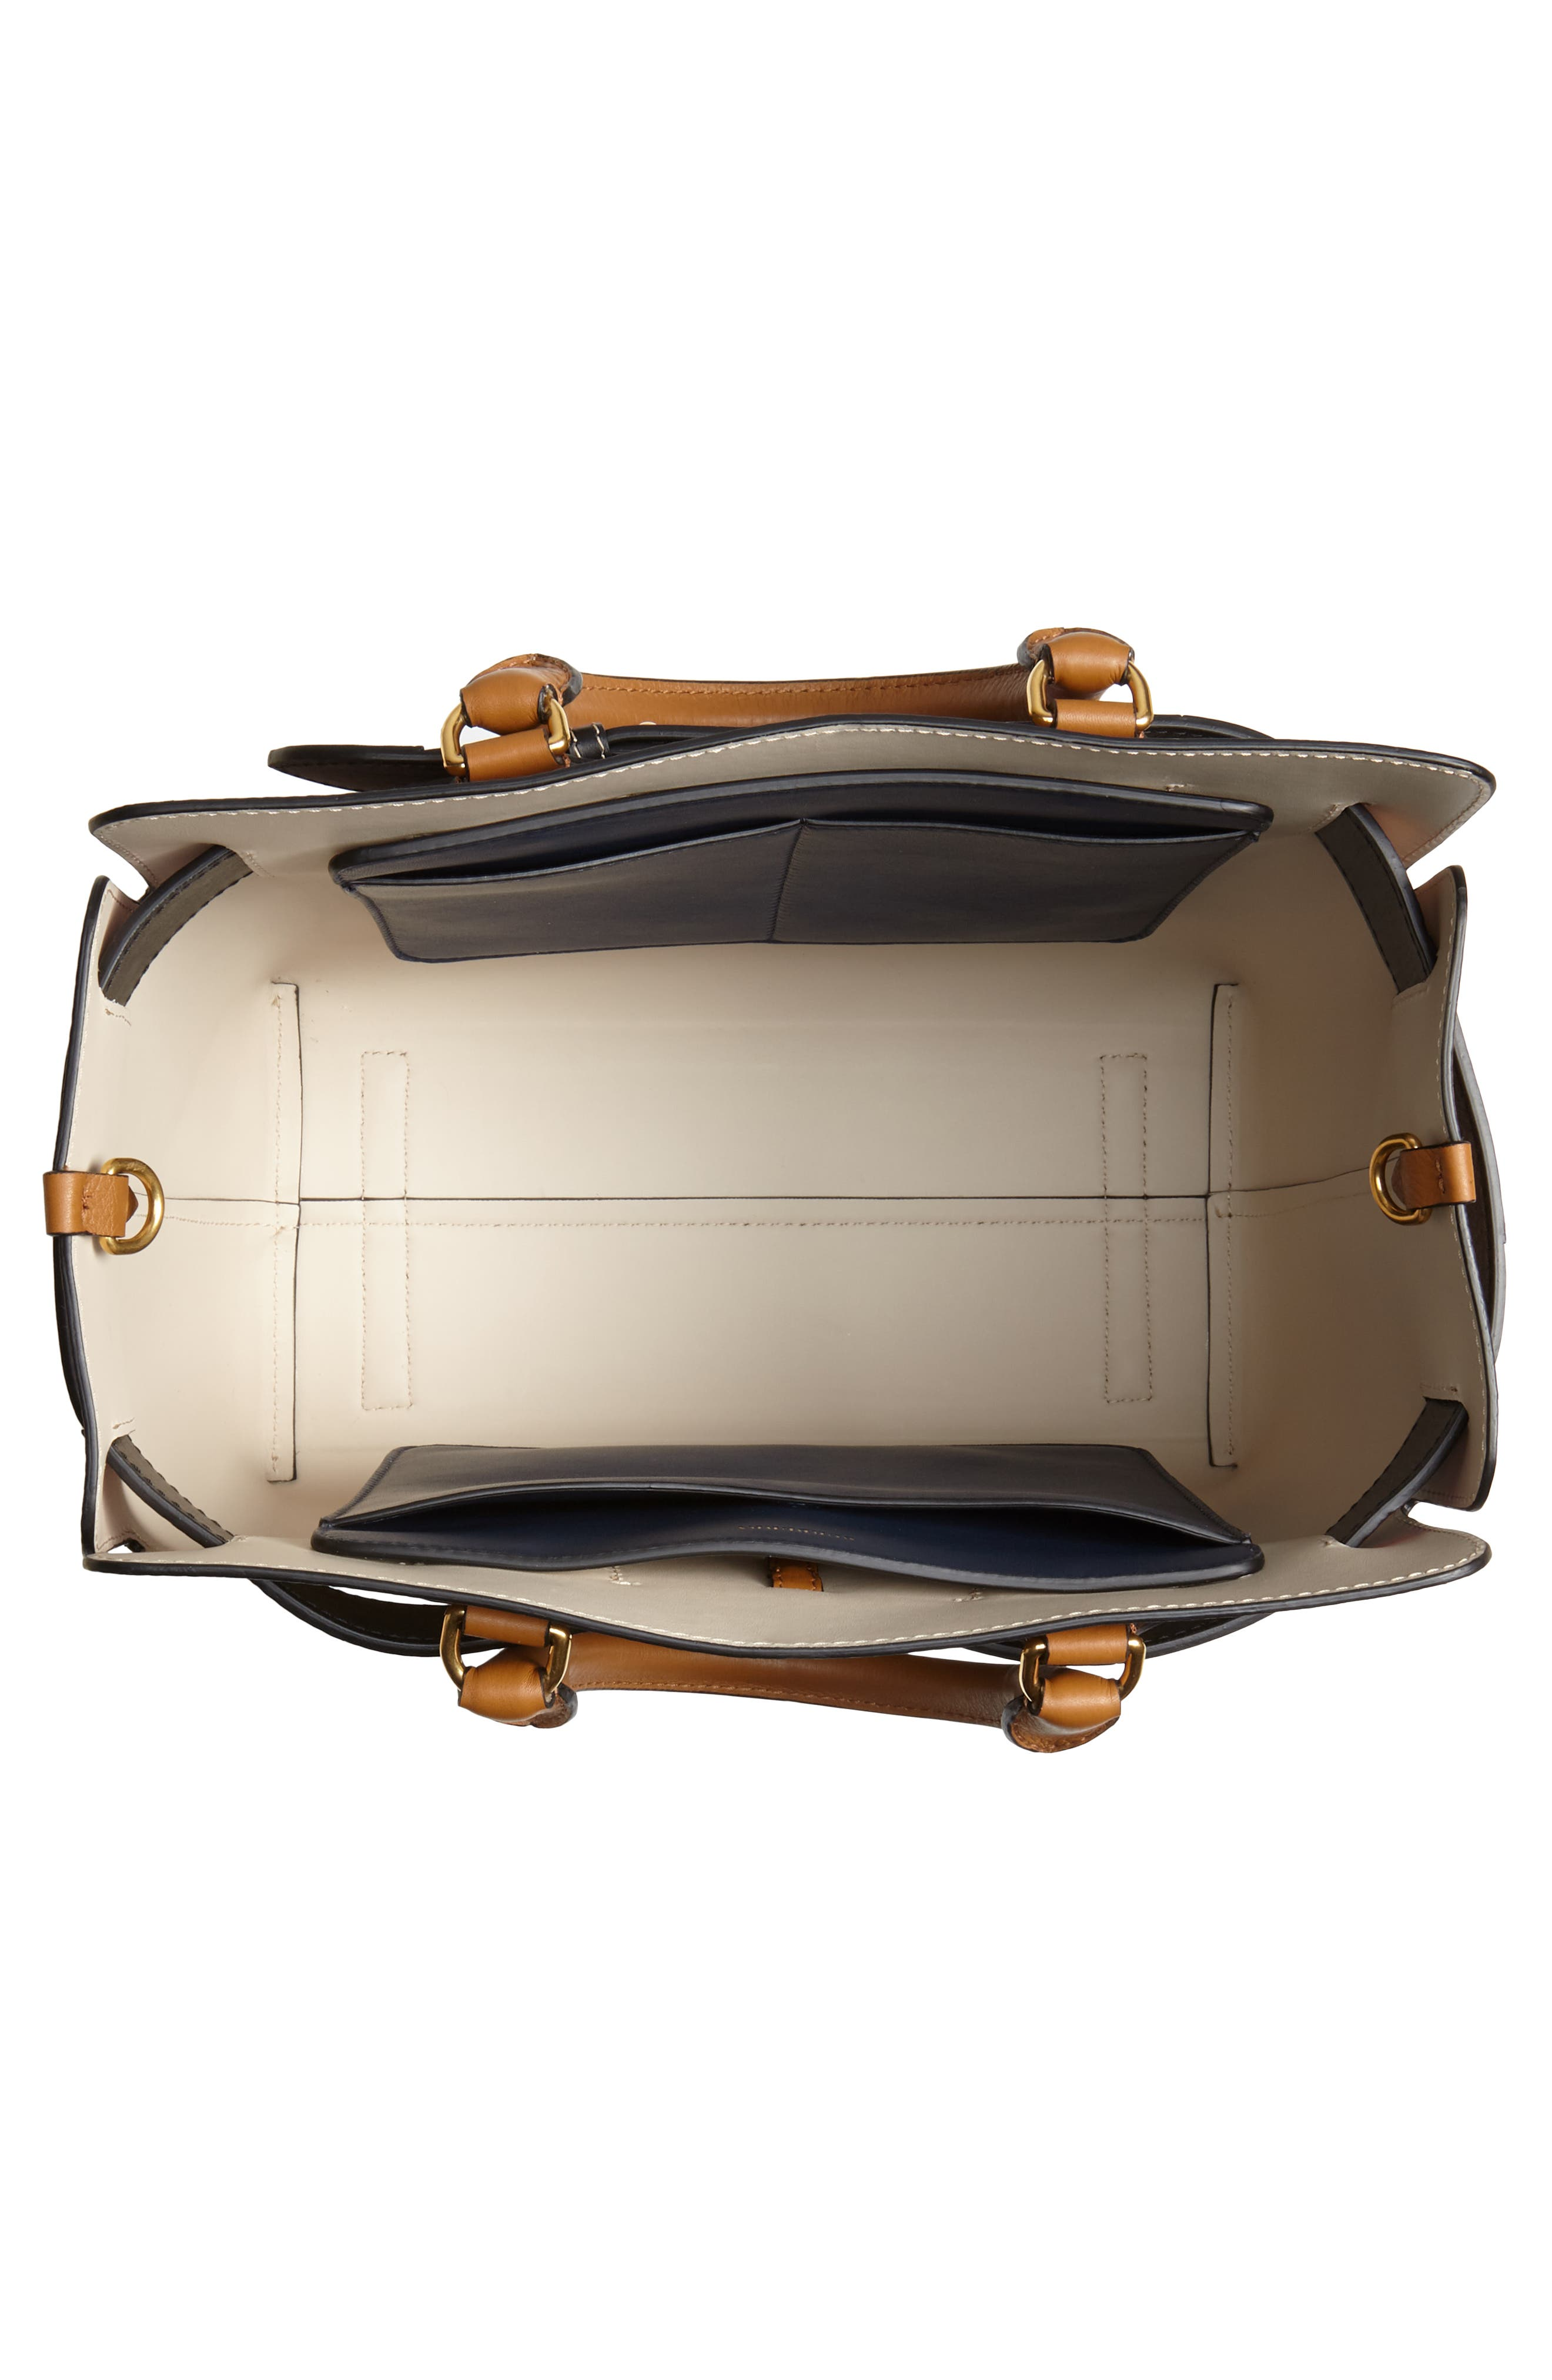 Medium Belt Bag Leather Tote,                             Alternate thumbnail 4, color,                             COGNAC